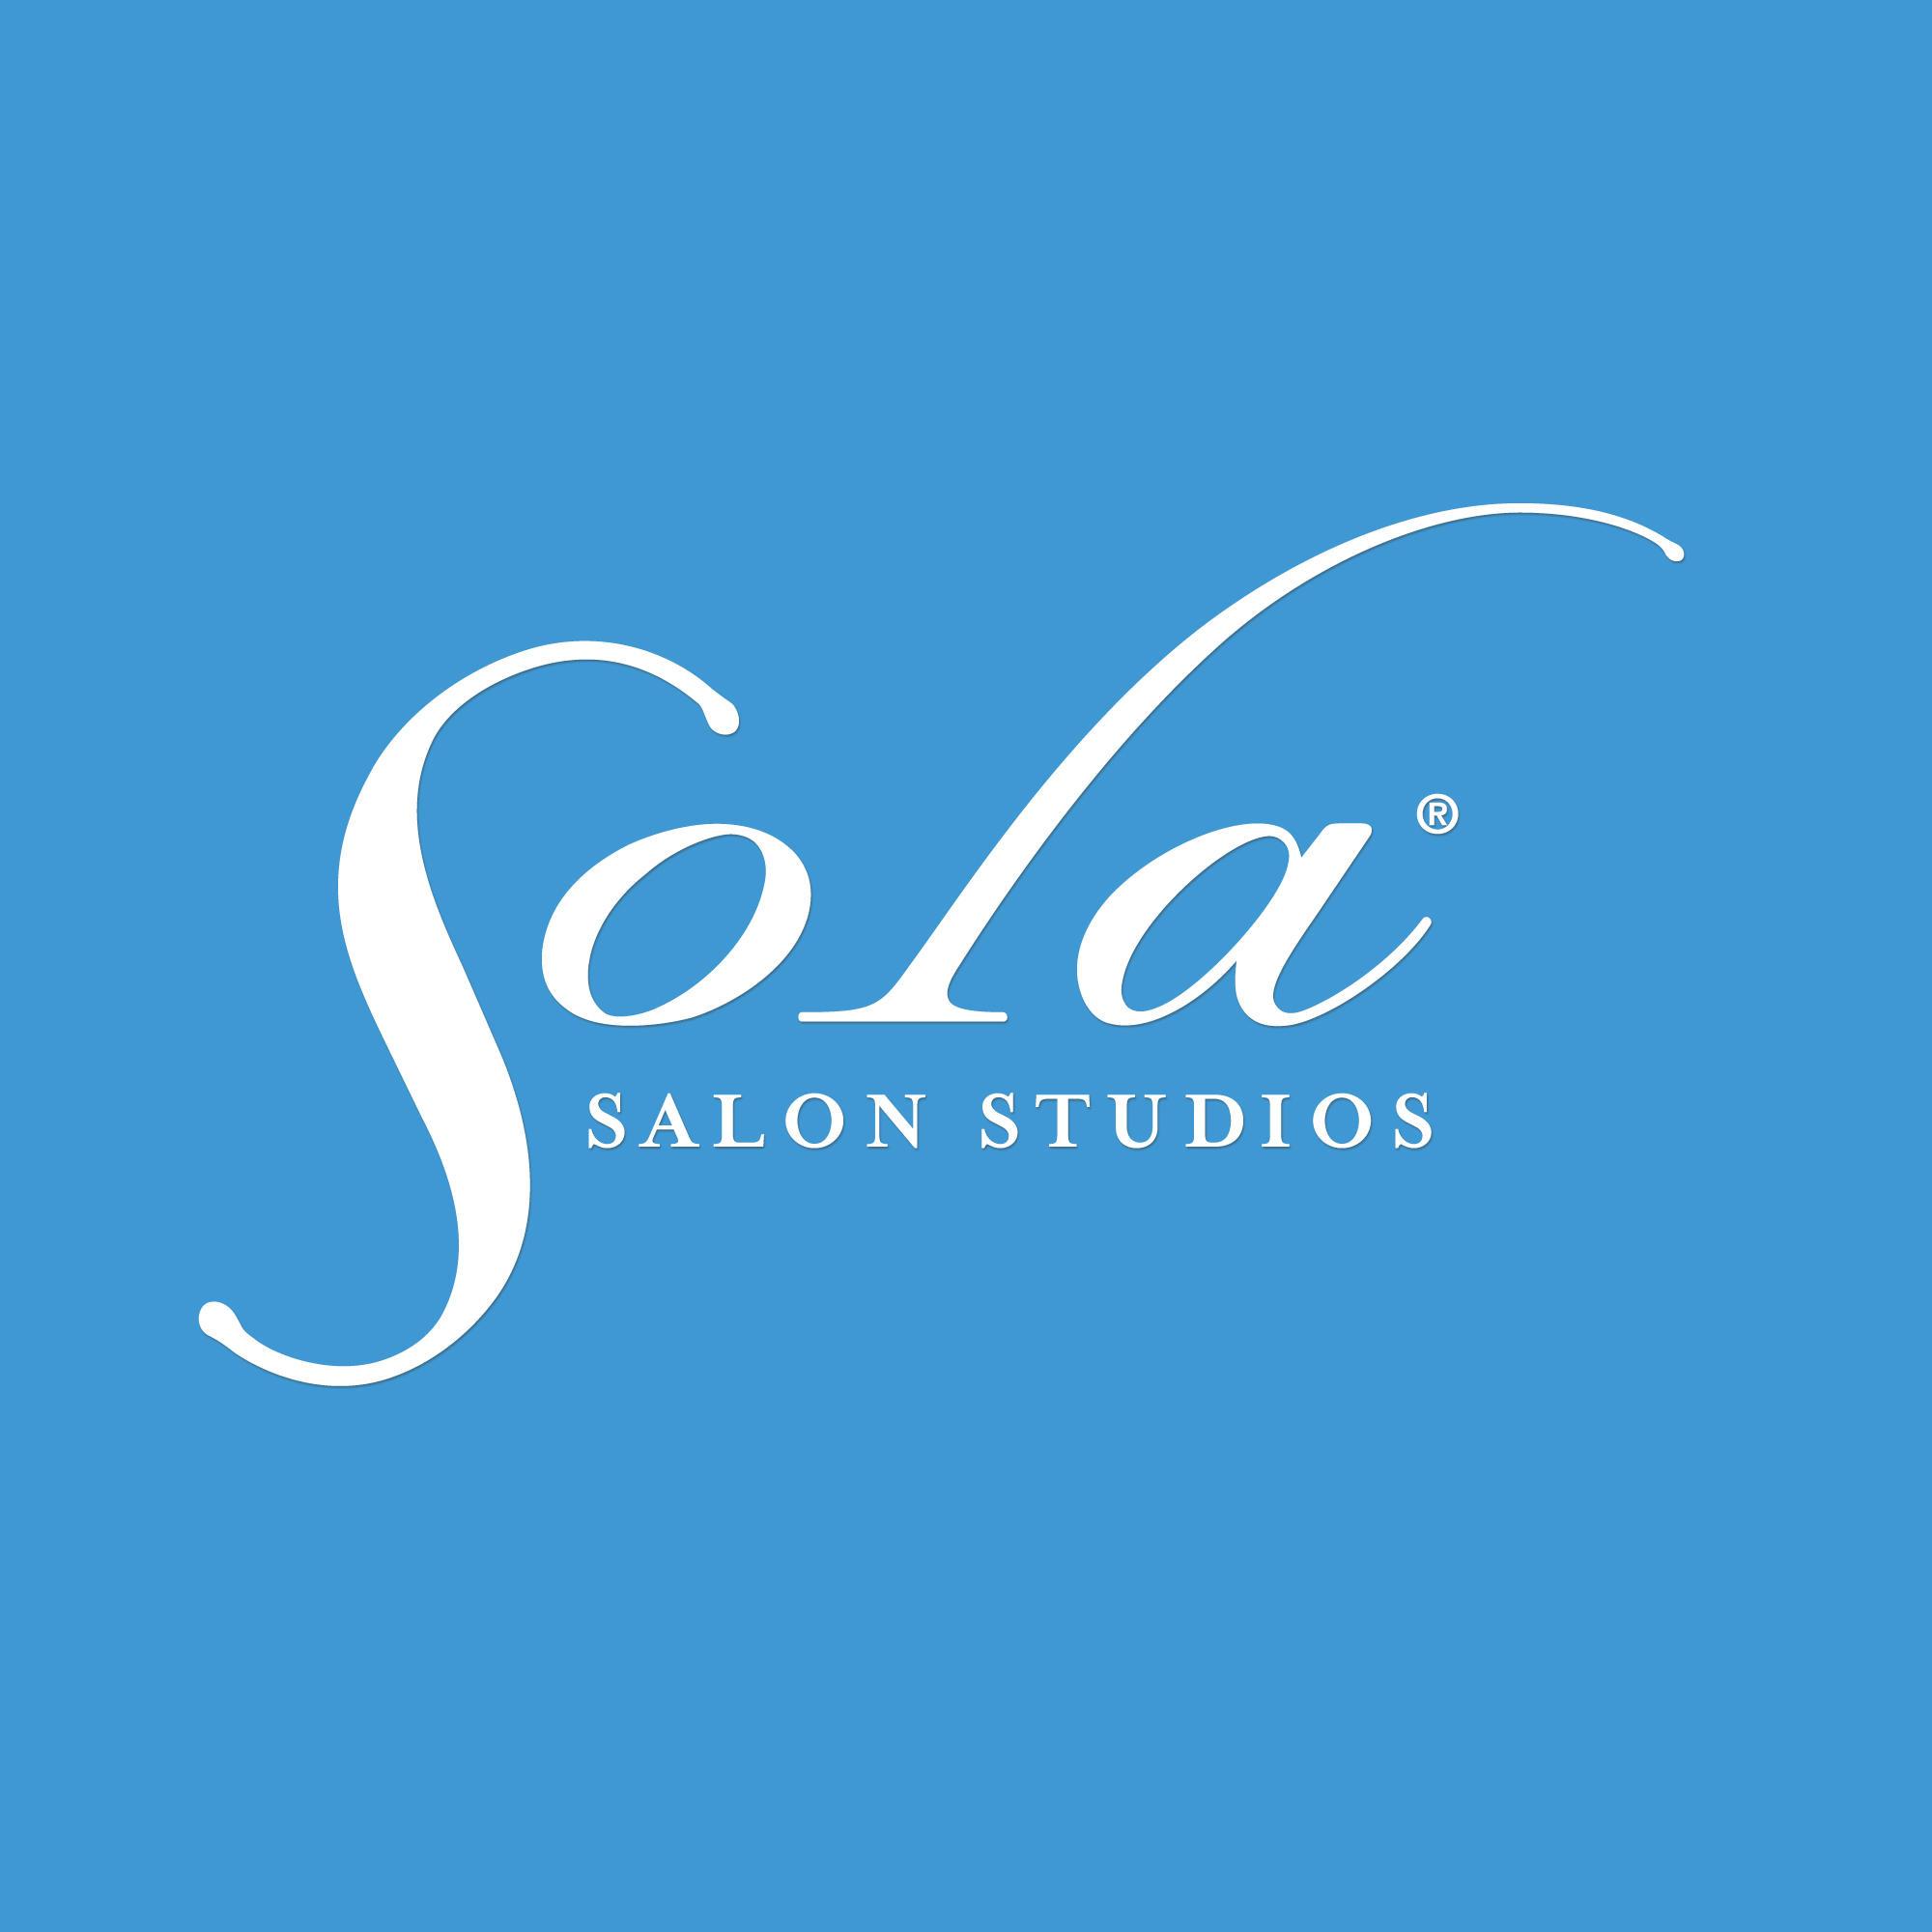 Sola Salon Studios - The Levee District